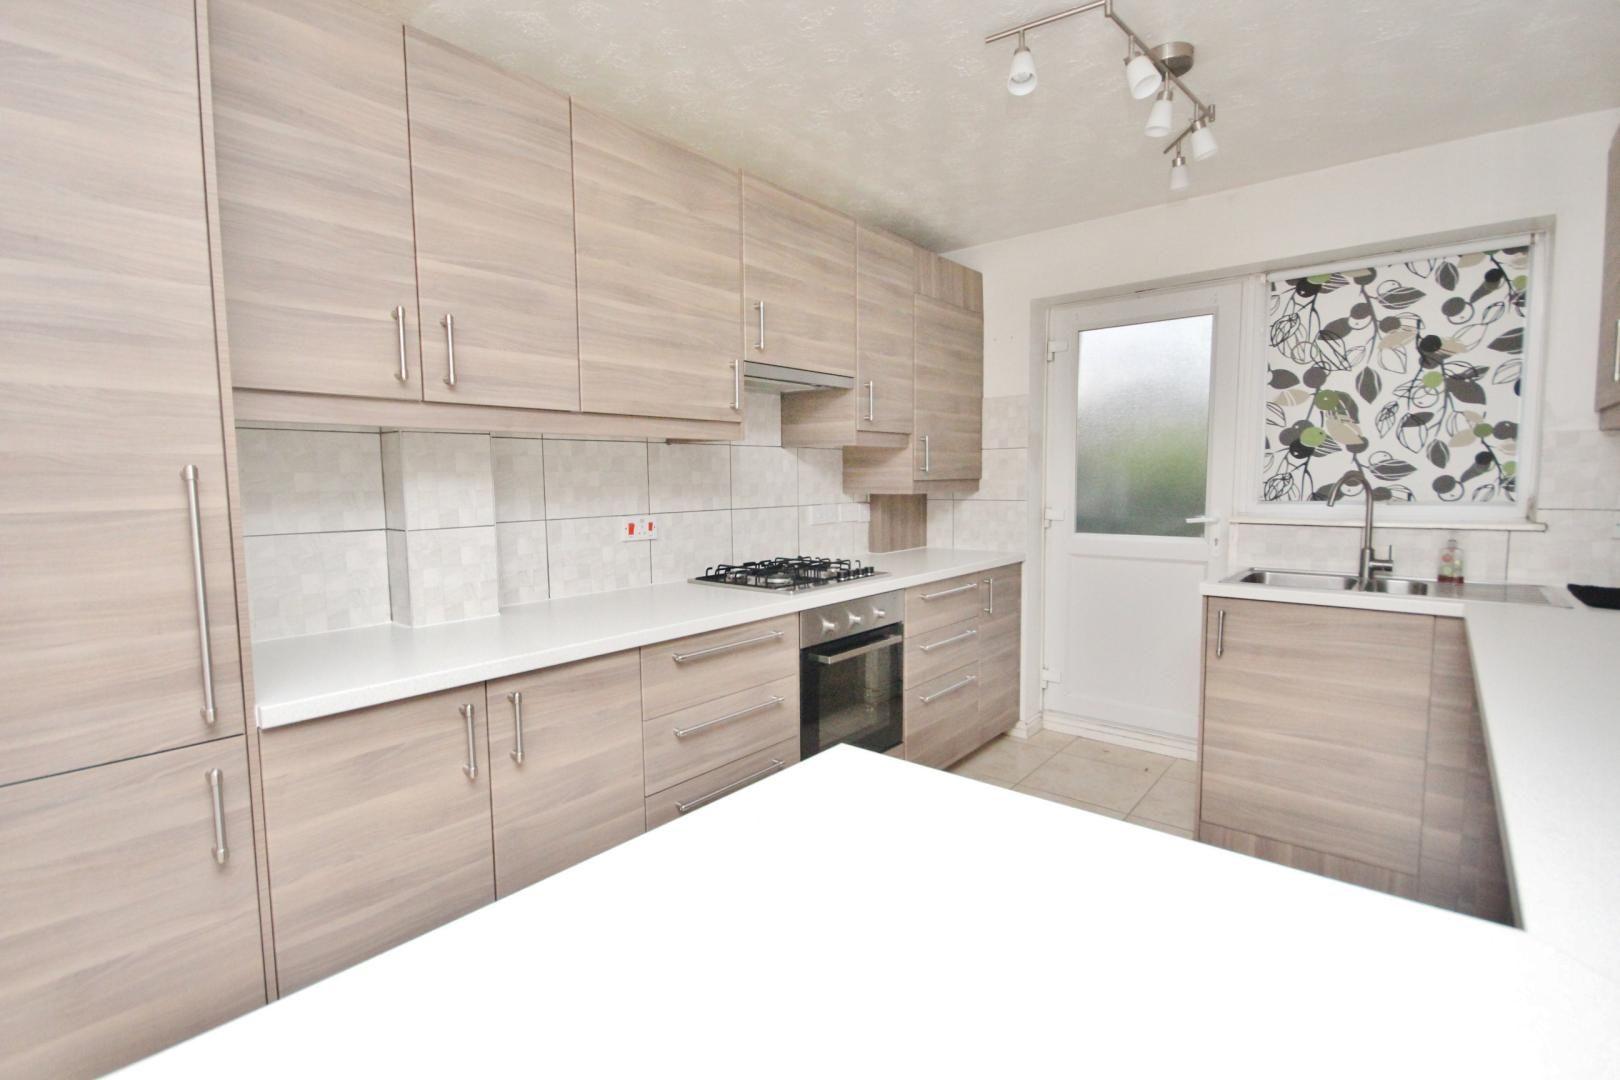 4 bed house for sale in Ambassador Gardens  - Property Image 5